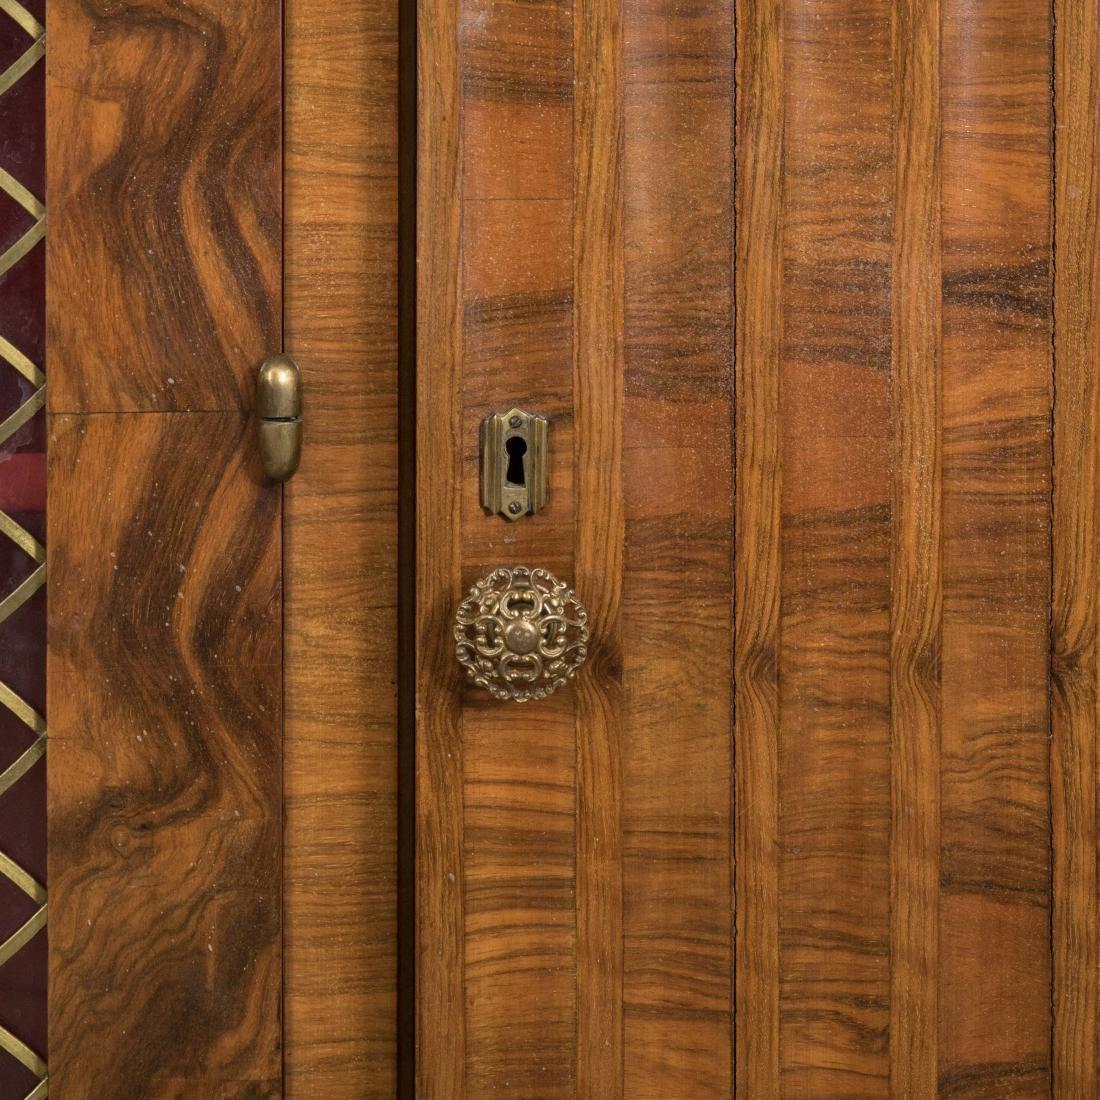 Burled English Art Deco Armoire - Epstein Brothers - 5